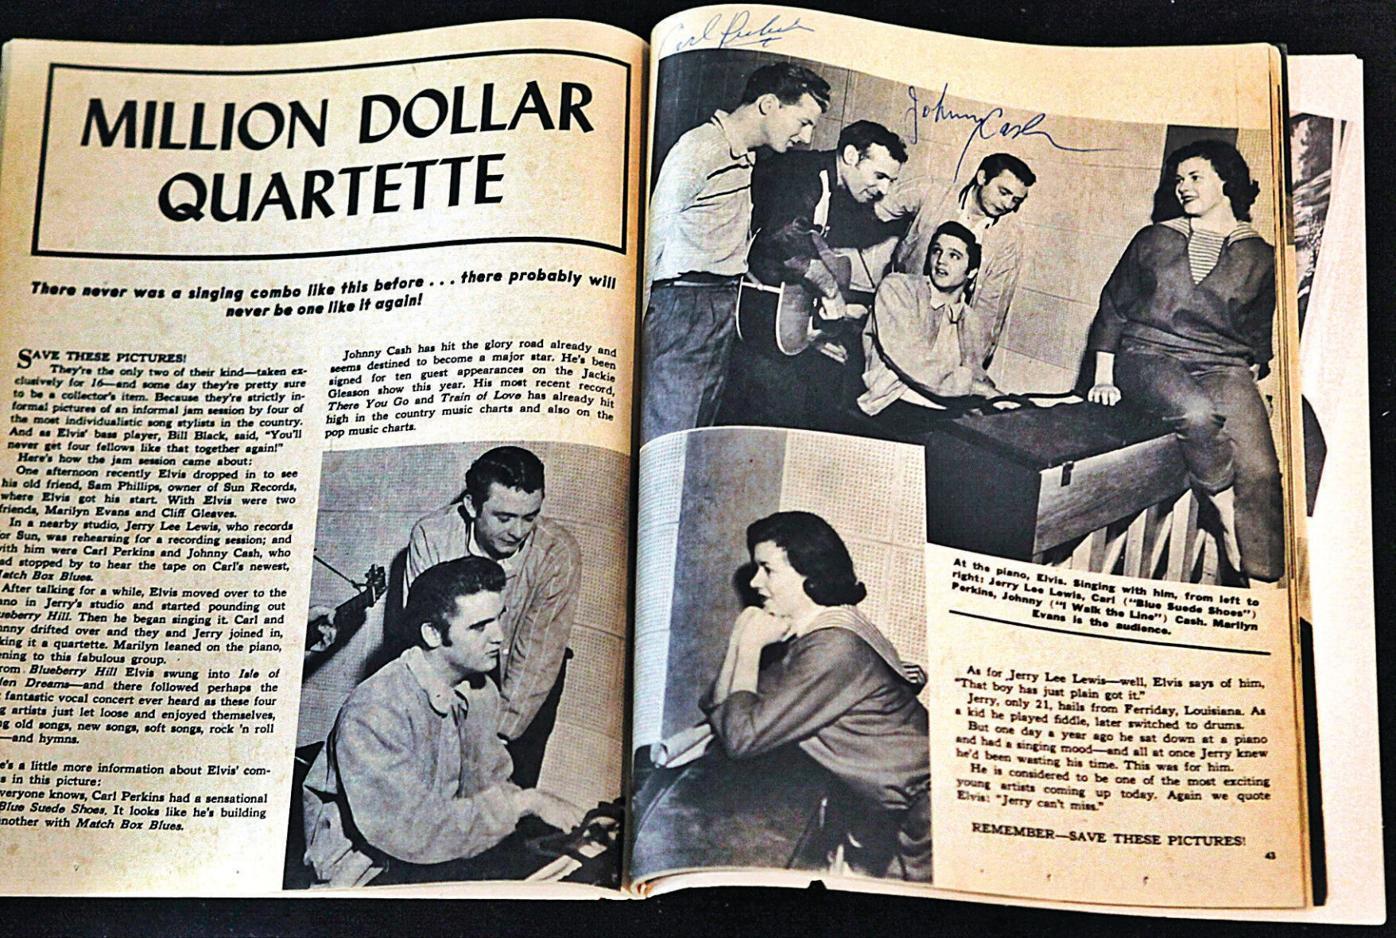 The legend behind the Million Dollar Quartet